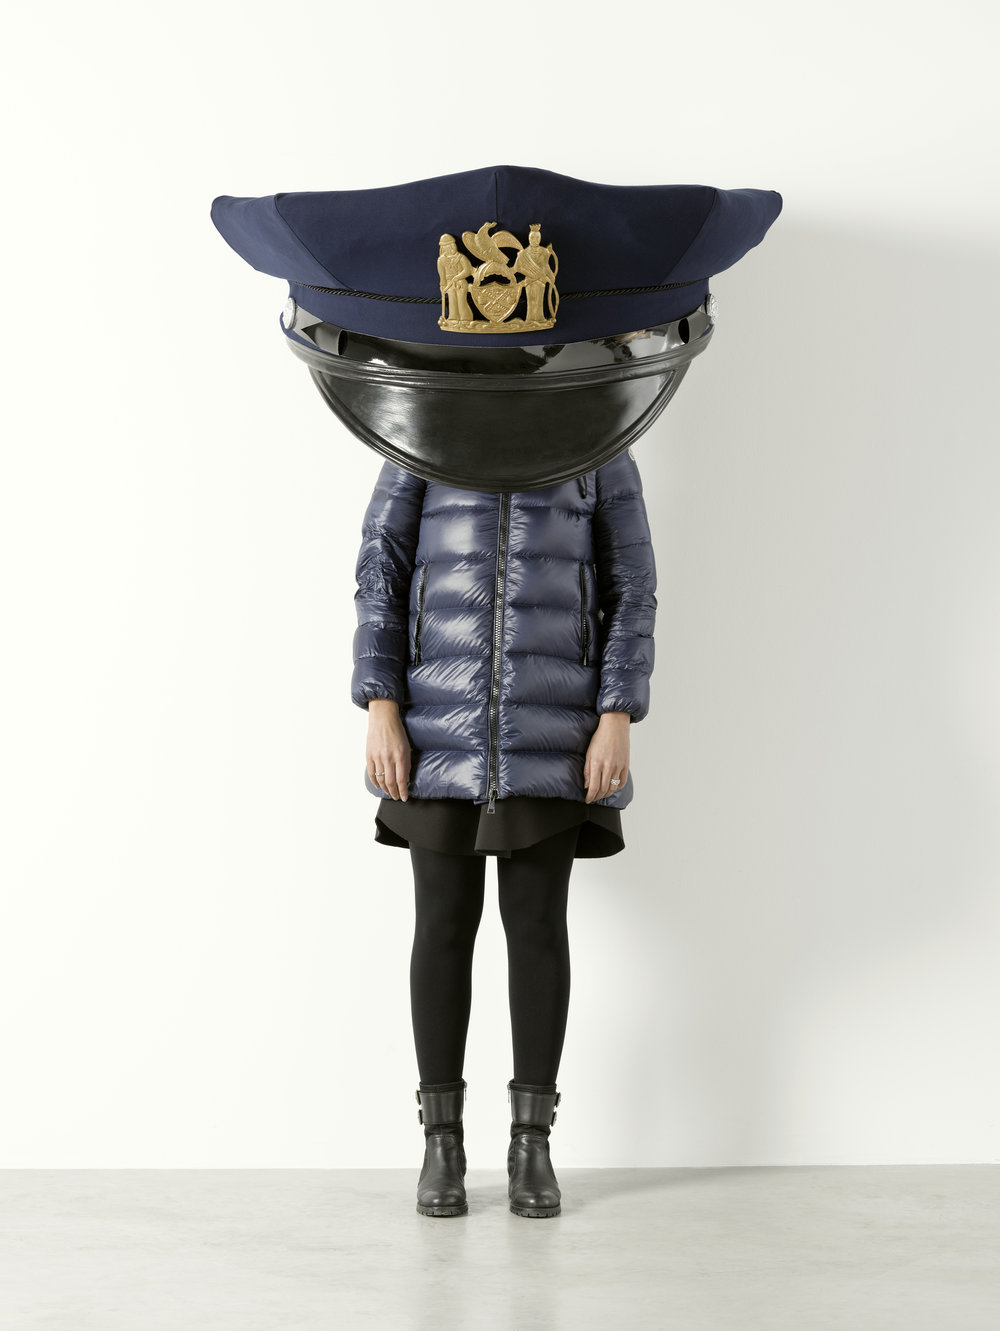 Erwin_Wurm_New_York_Police_Cap_Gold_1.jpg